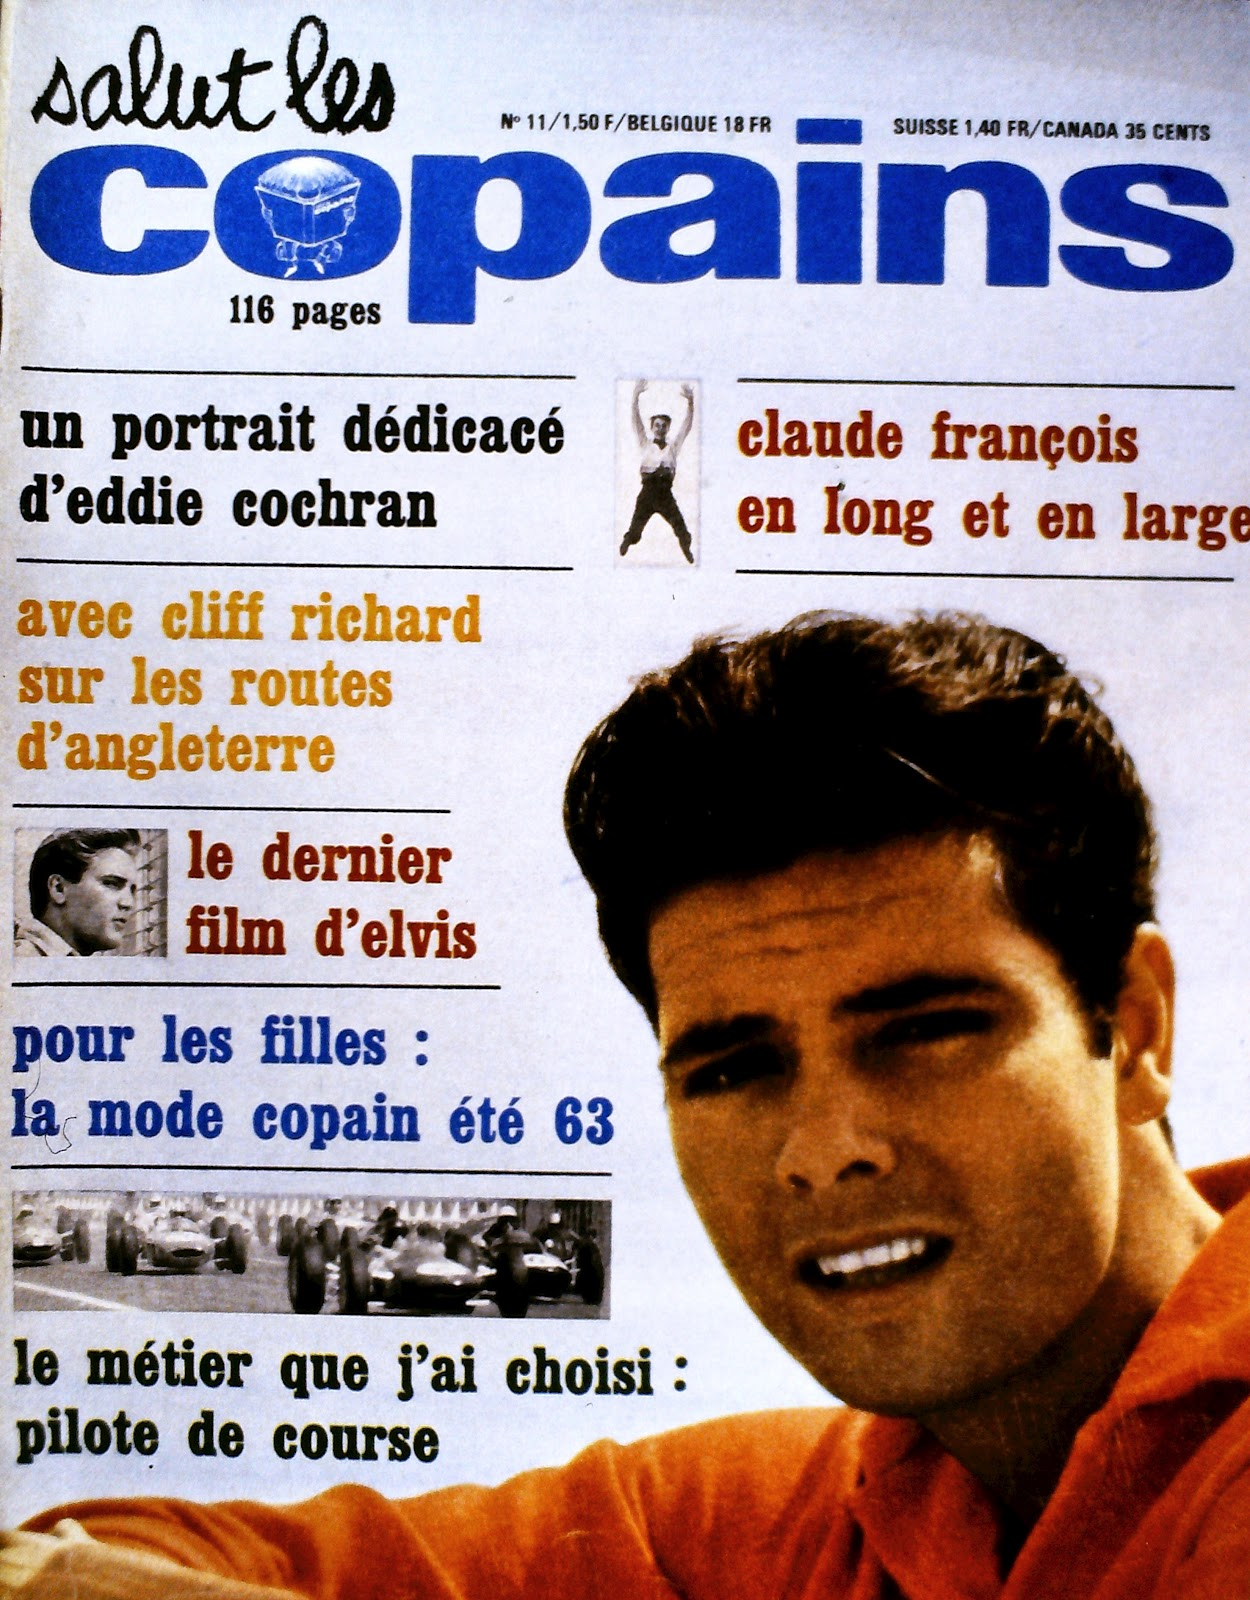 http://1.bp.blogspot.com/-kKtbnx0TCDY/UFivjAXZtfI/AAAAAAAAXRg/YcwNxOs3cB0/s1600/Salut+Les+Copains+N%C2%B0+11+June+1963+Cliff+Richard+SB+85956.JPG